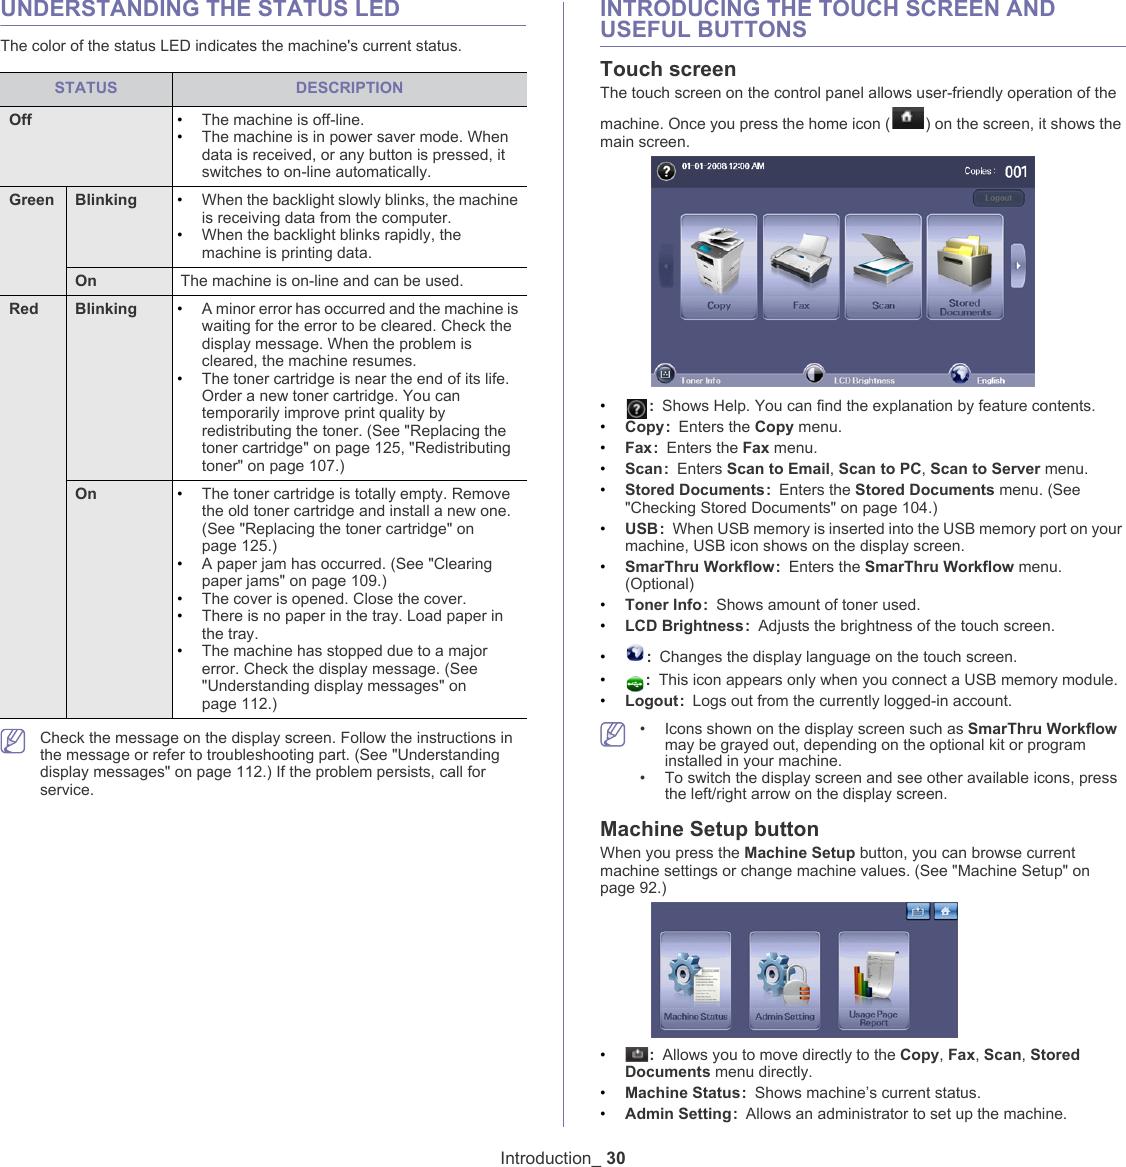 Samsung Scx 5935 Series Users Manual ManualsLib Makes It